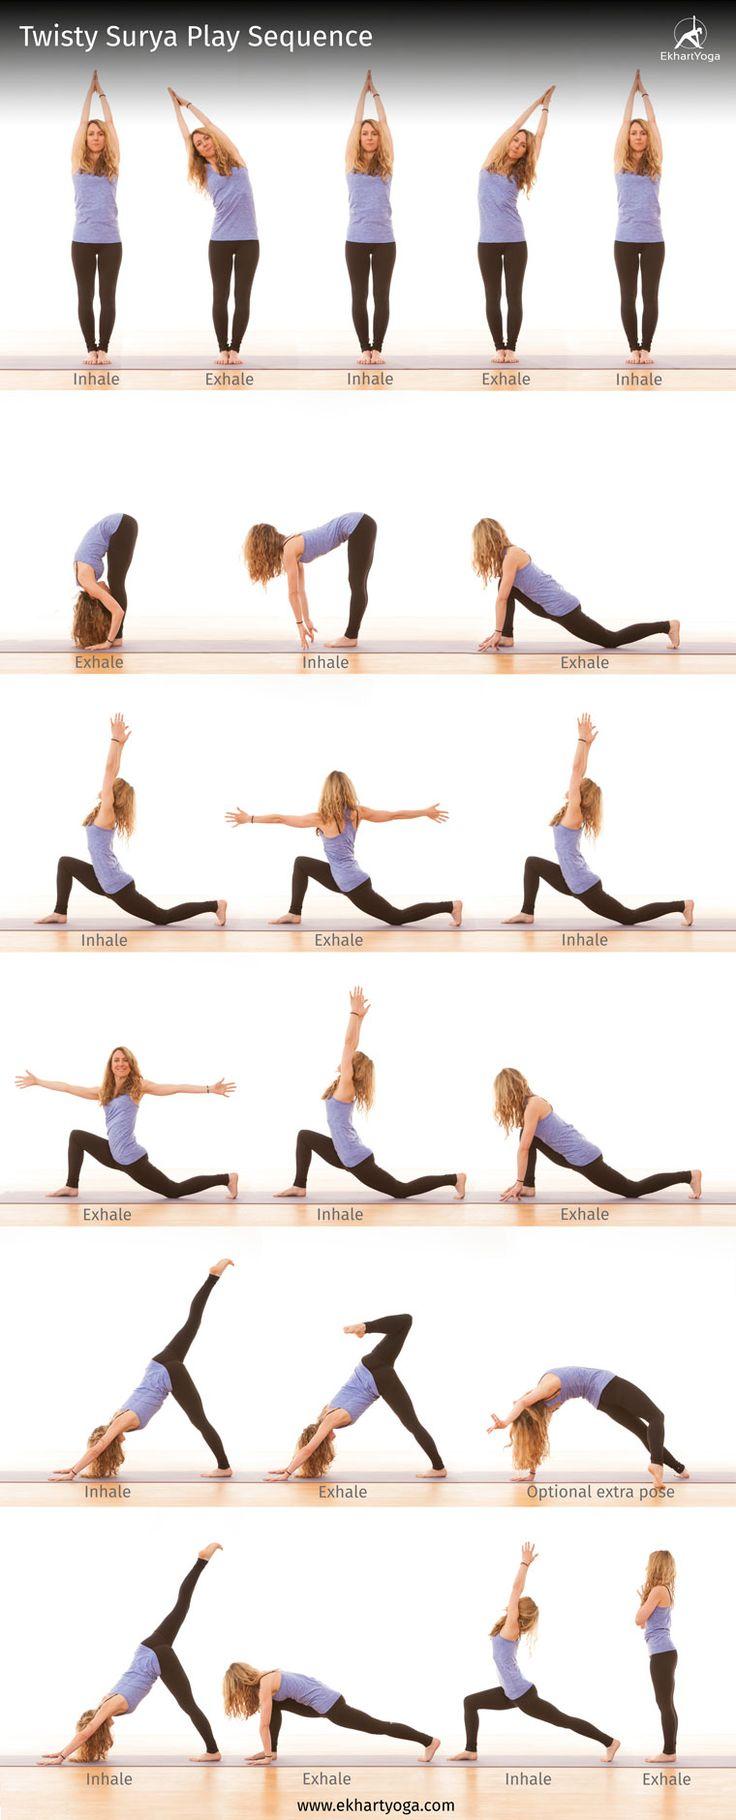 Twisty Surya Play Sequence – Ekhart Yoga